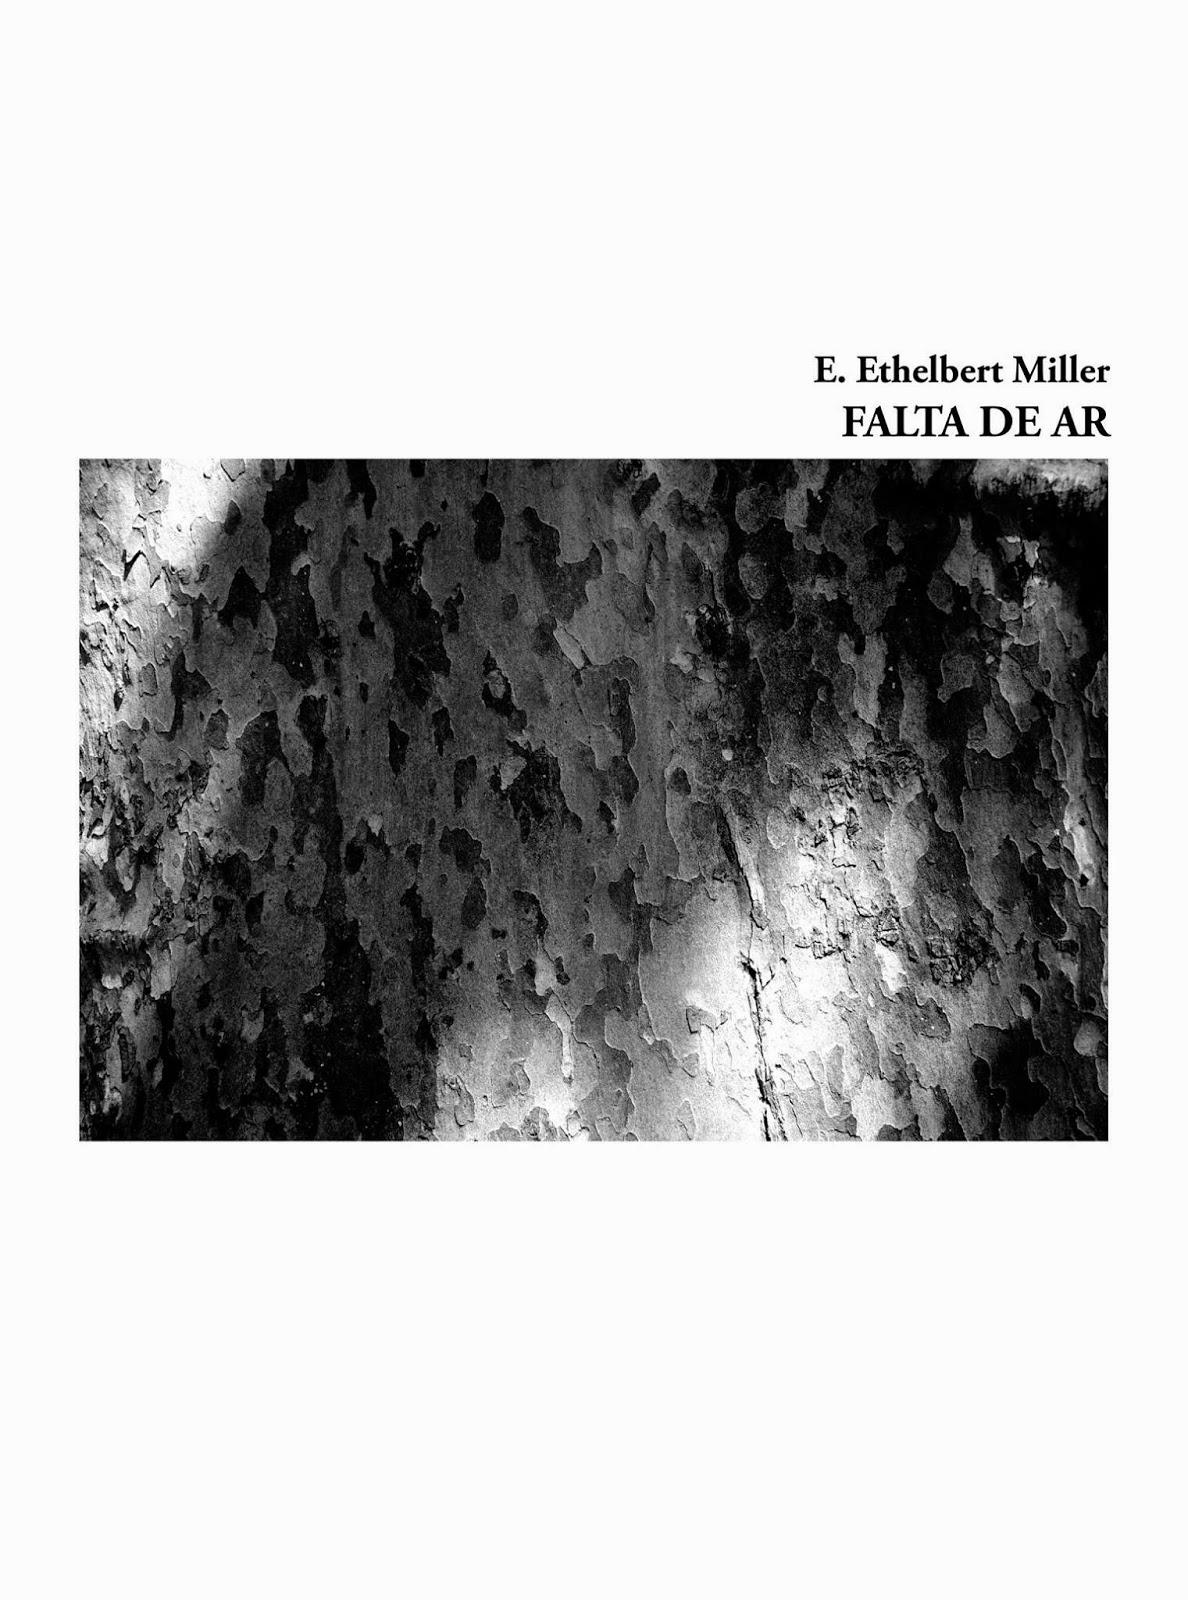 E. Ethelbert Miller, Medula, Poesia, Falta de Ar